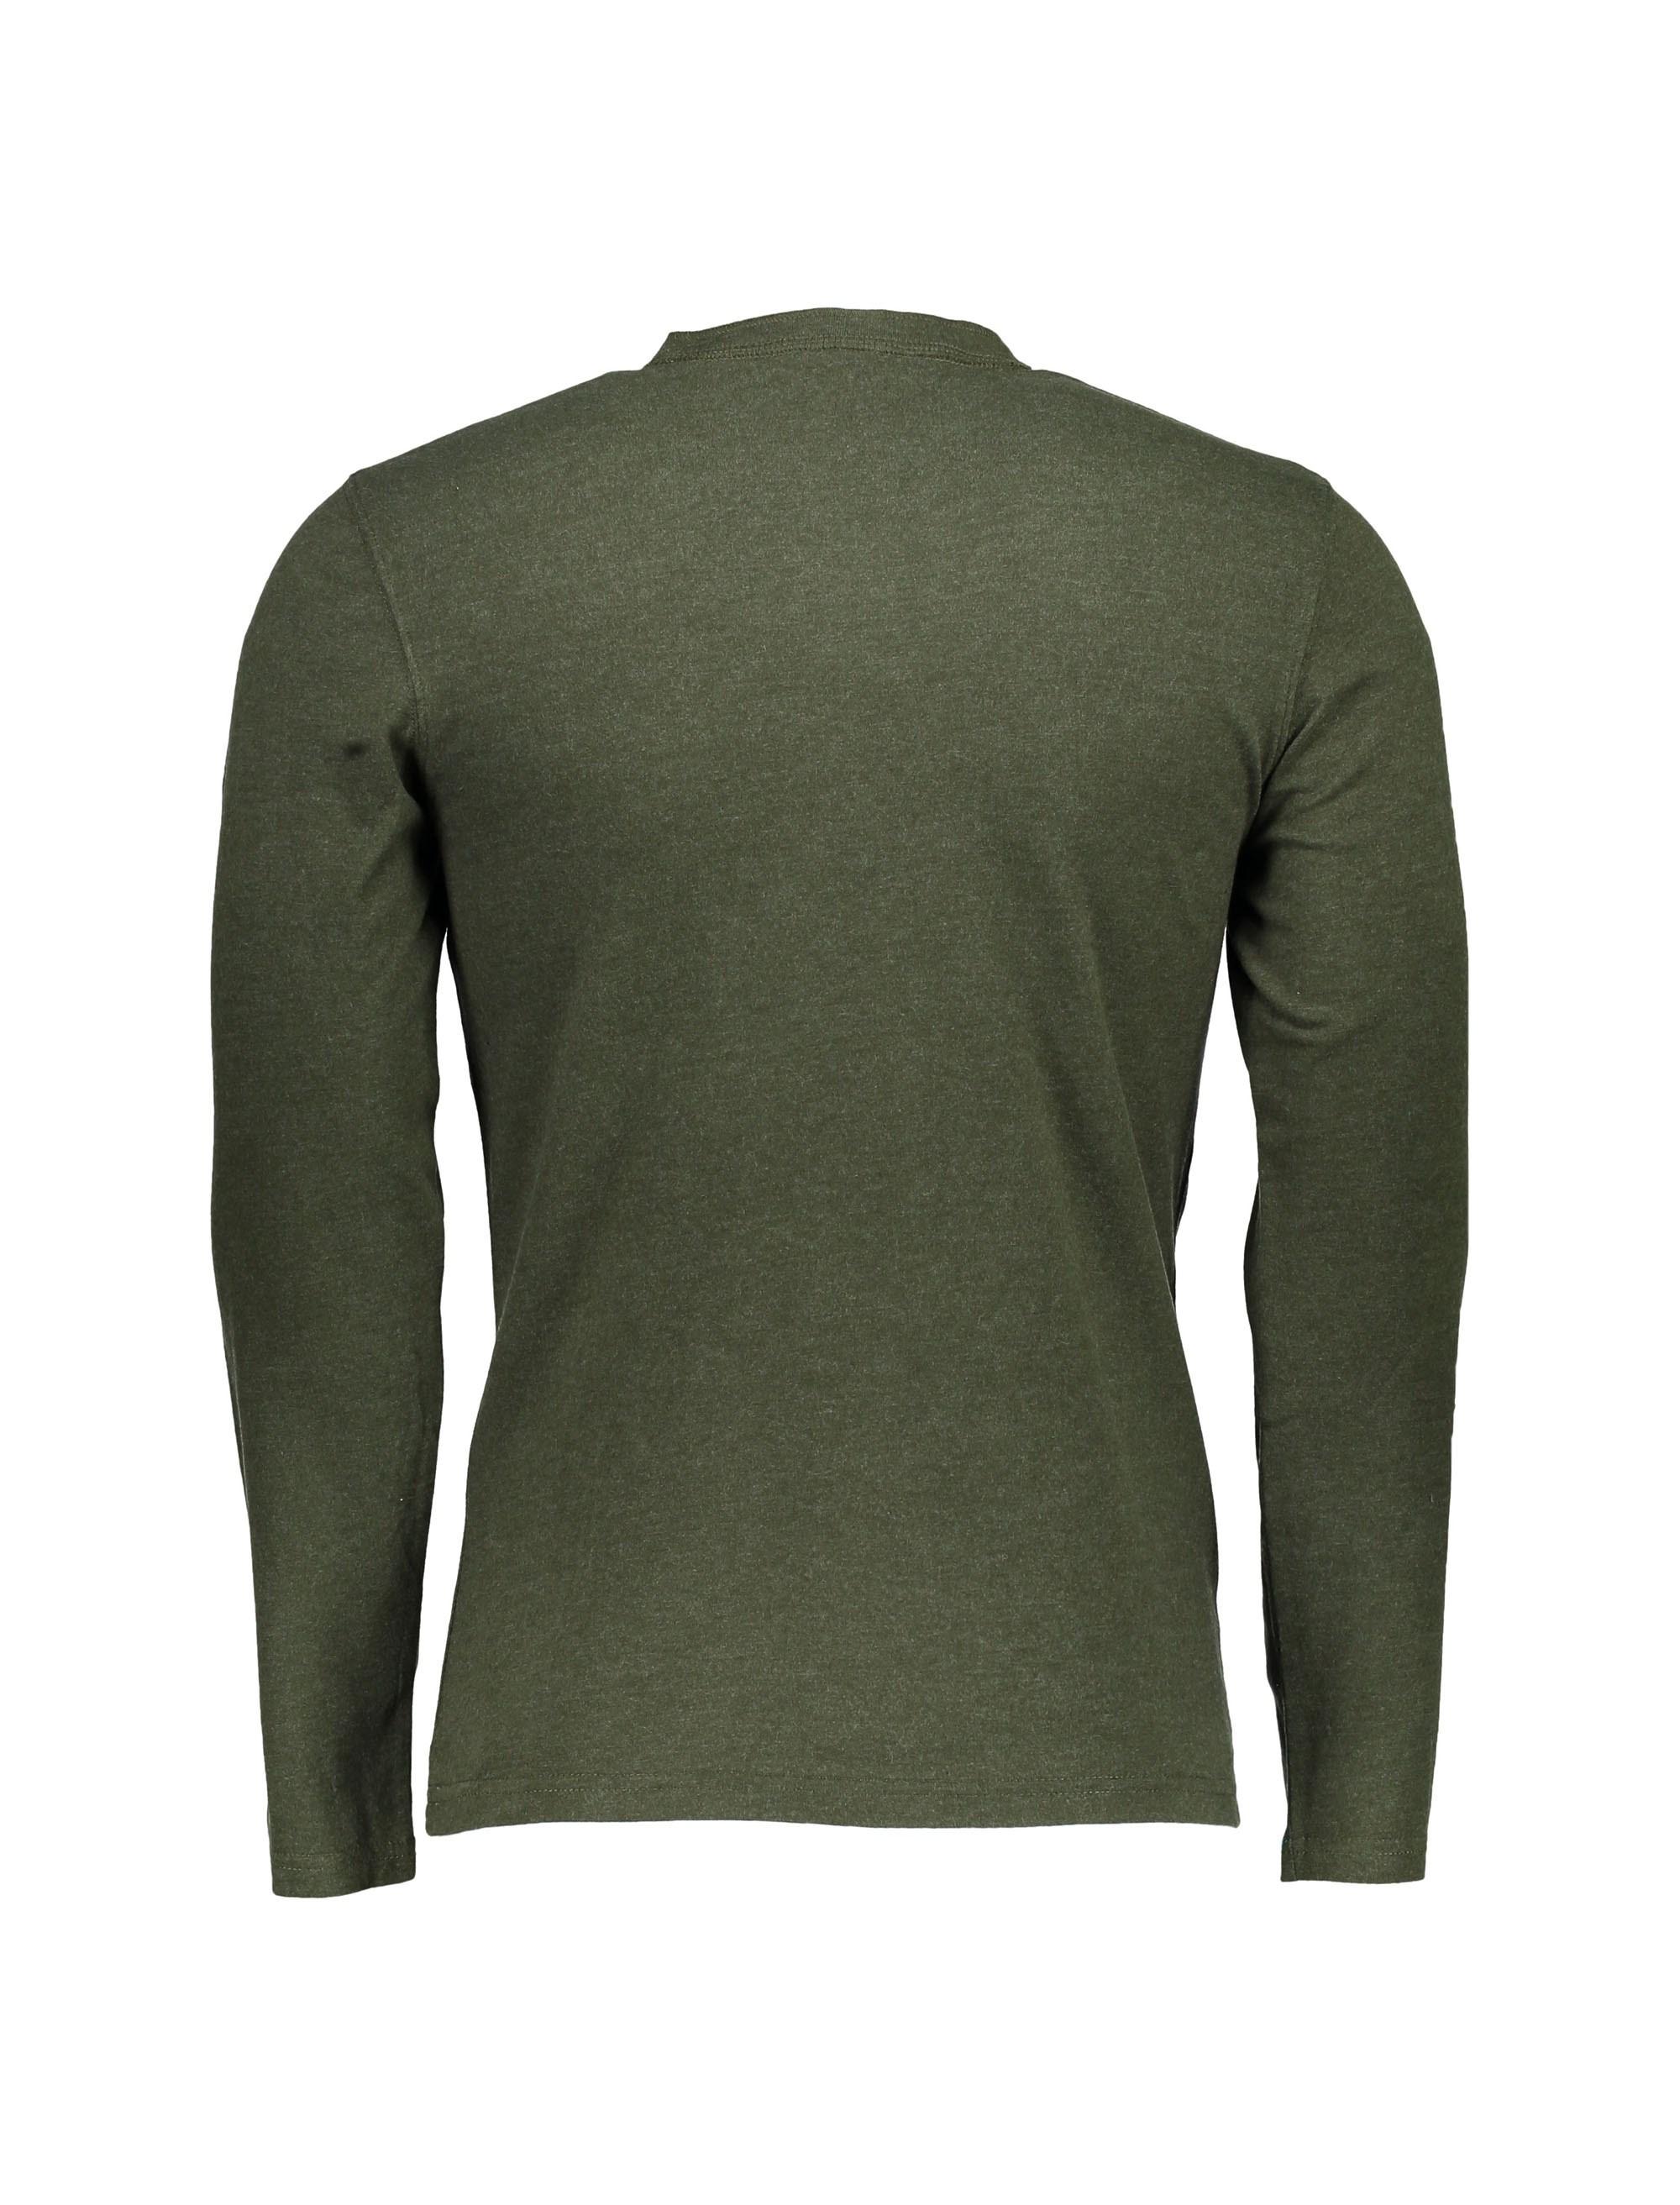 تی شرت نخی یقه گرد مردانه - سلیو - زيتوني - 2